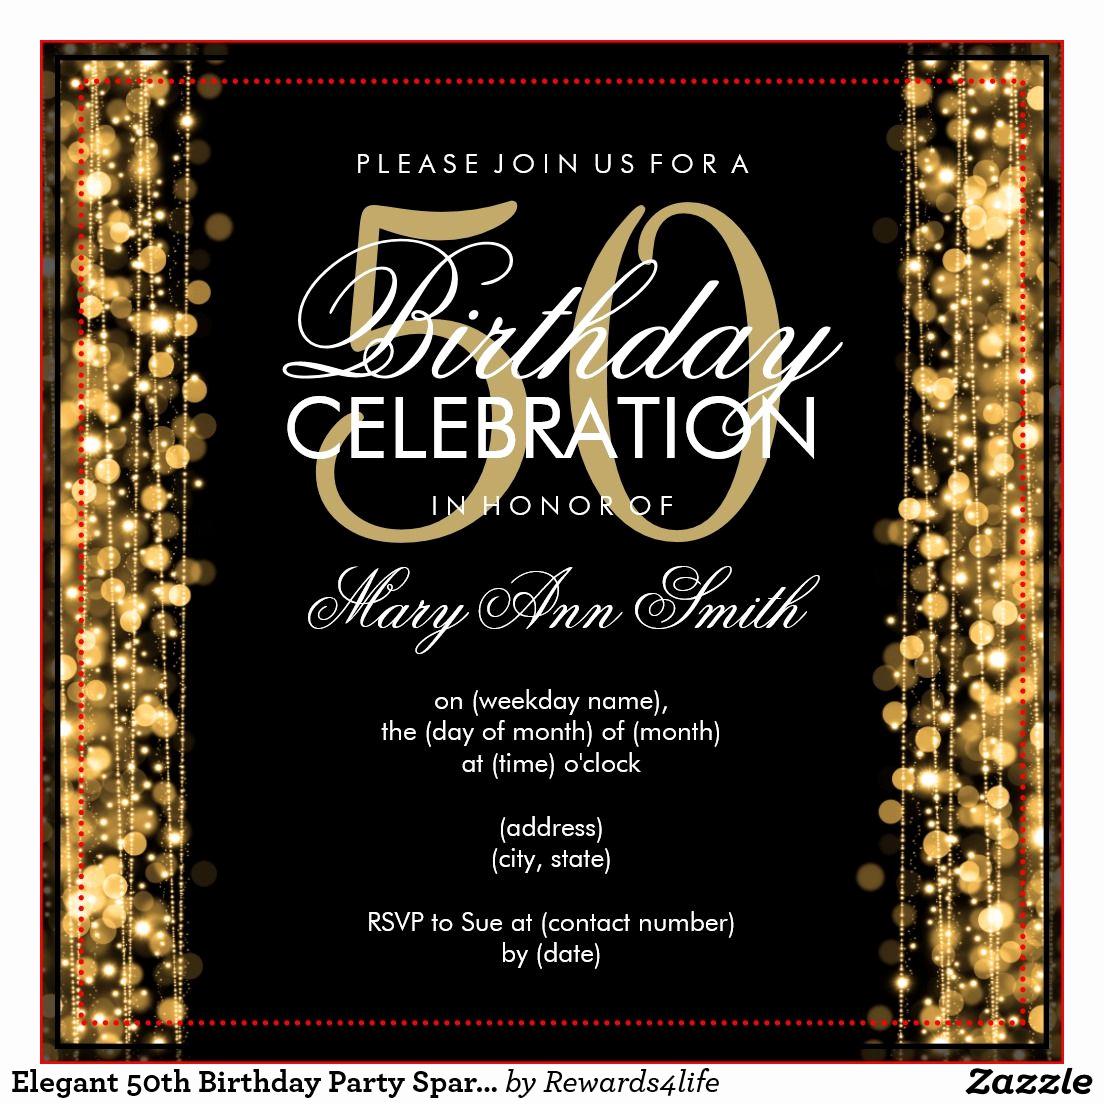 50th Birthday Invitation Ideas Inspirational 50th Birthday Male Party Ideas Google Search